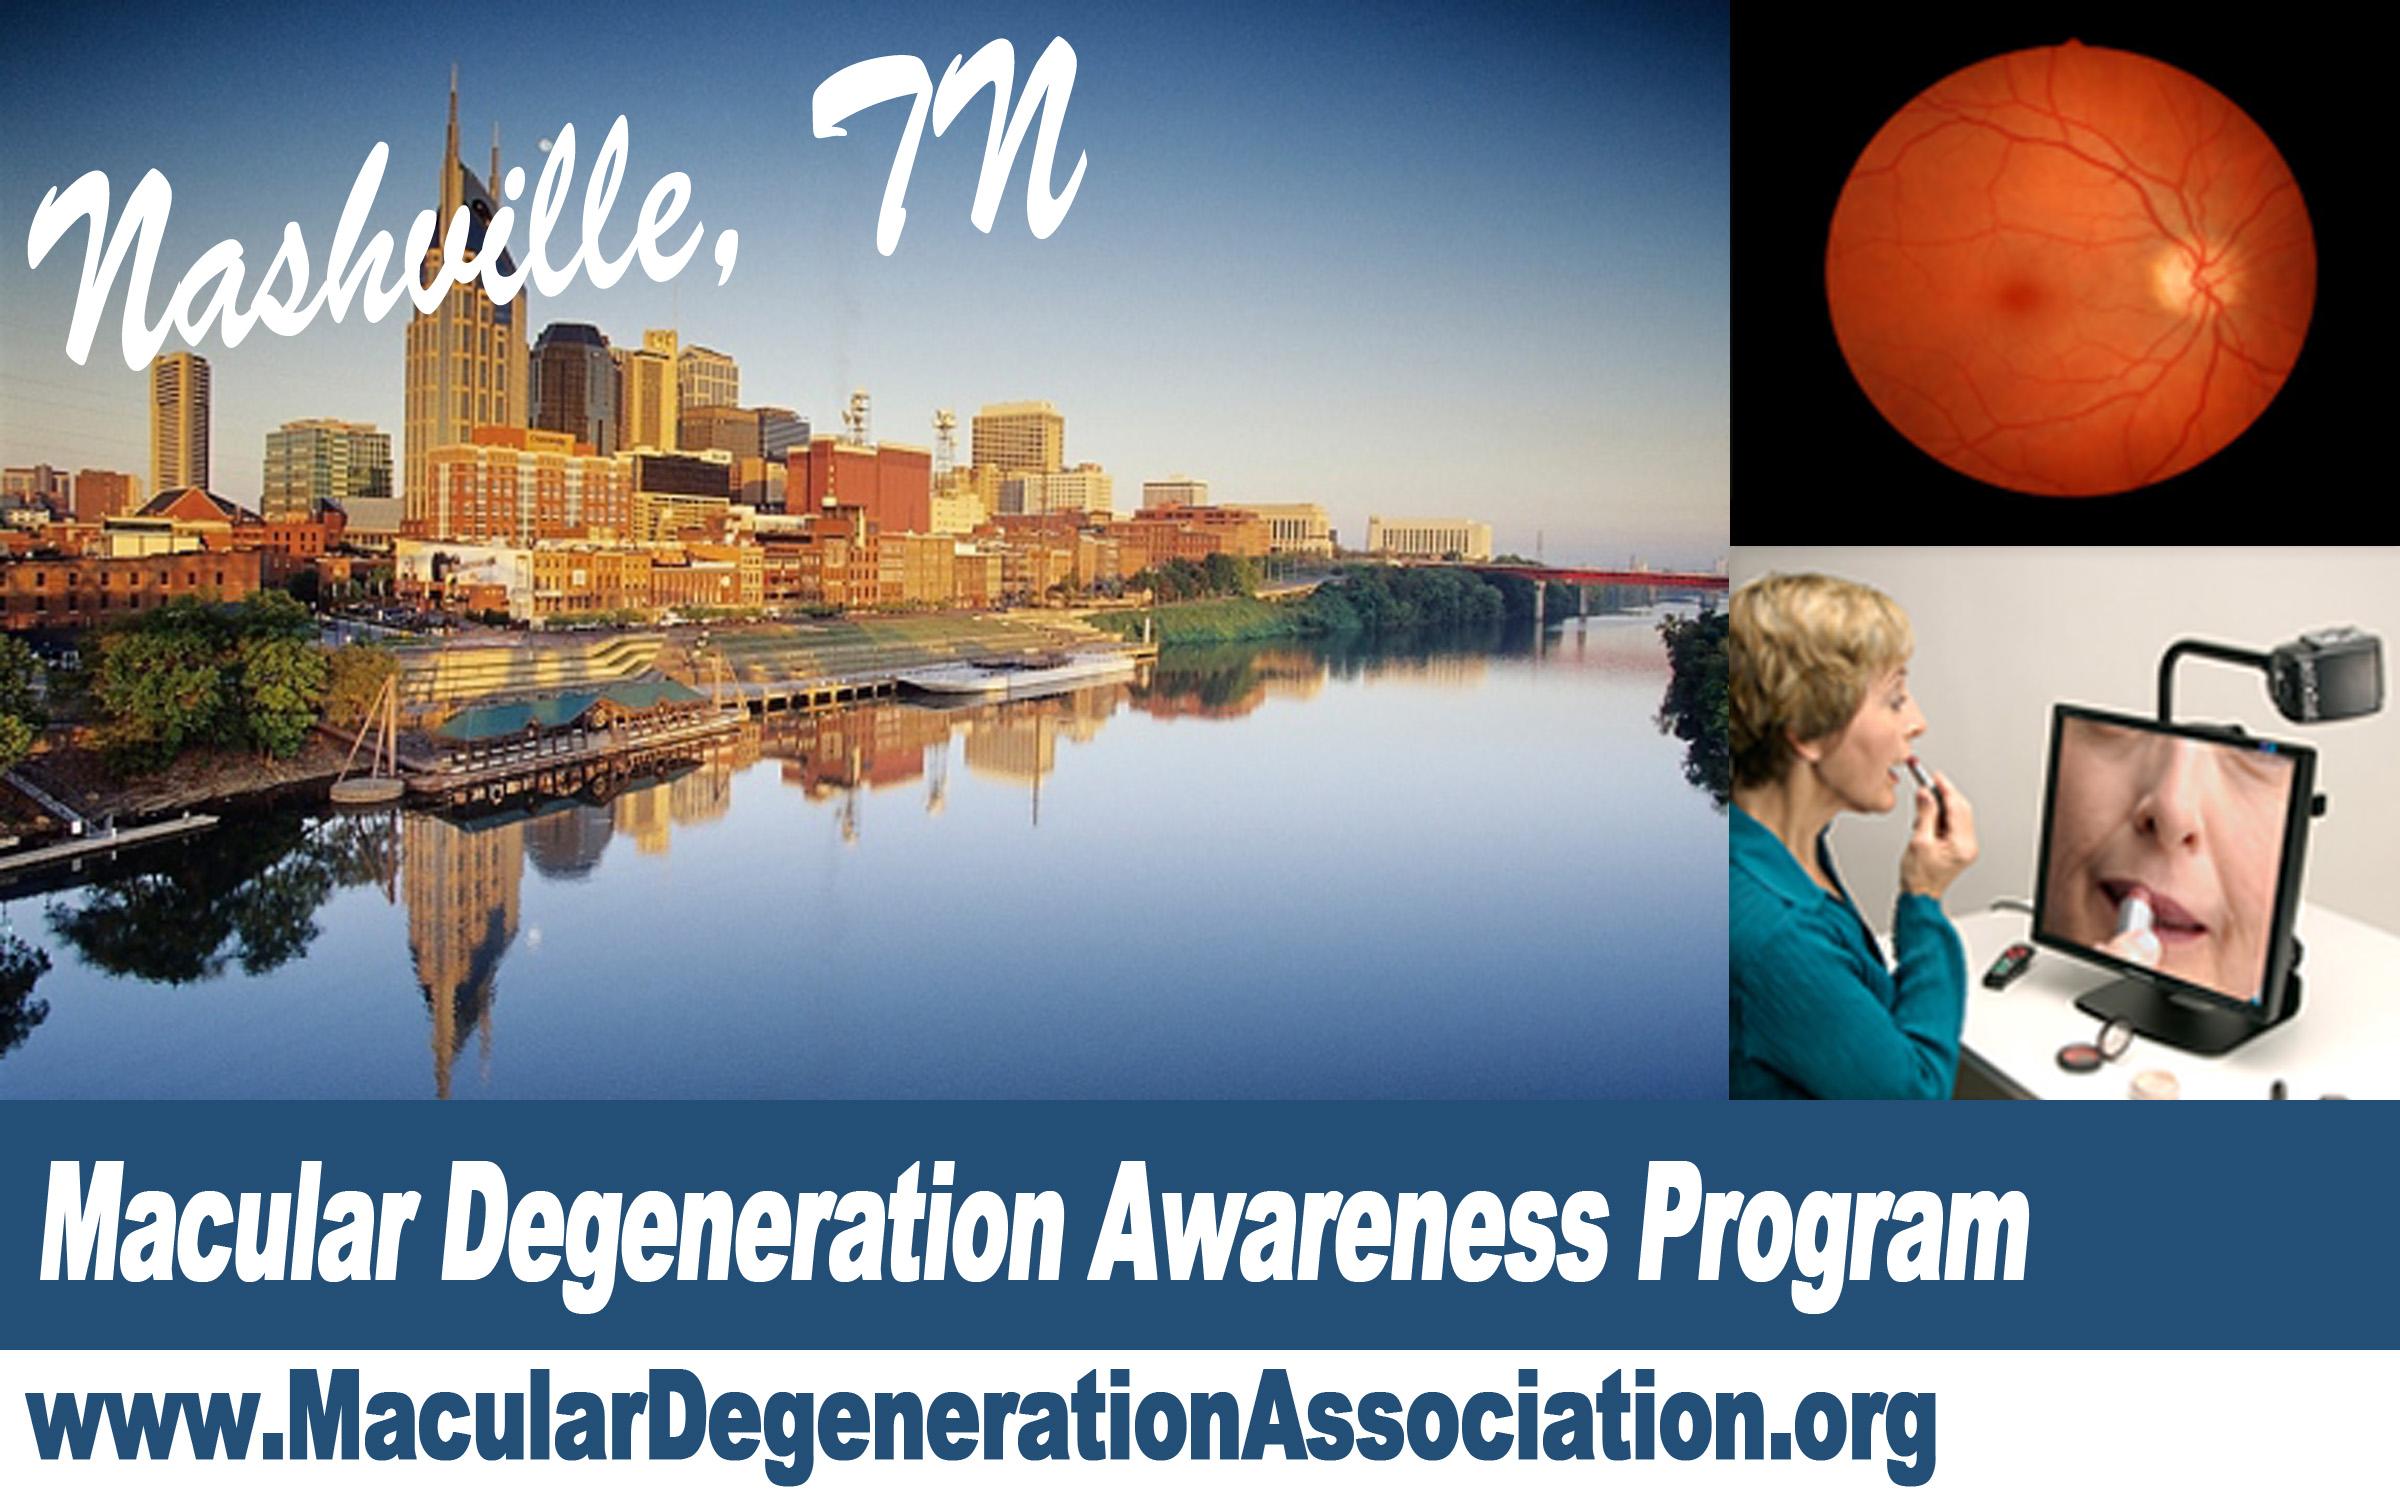 Macular Degeneration awareness program Nashville